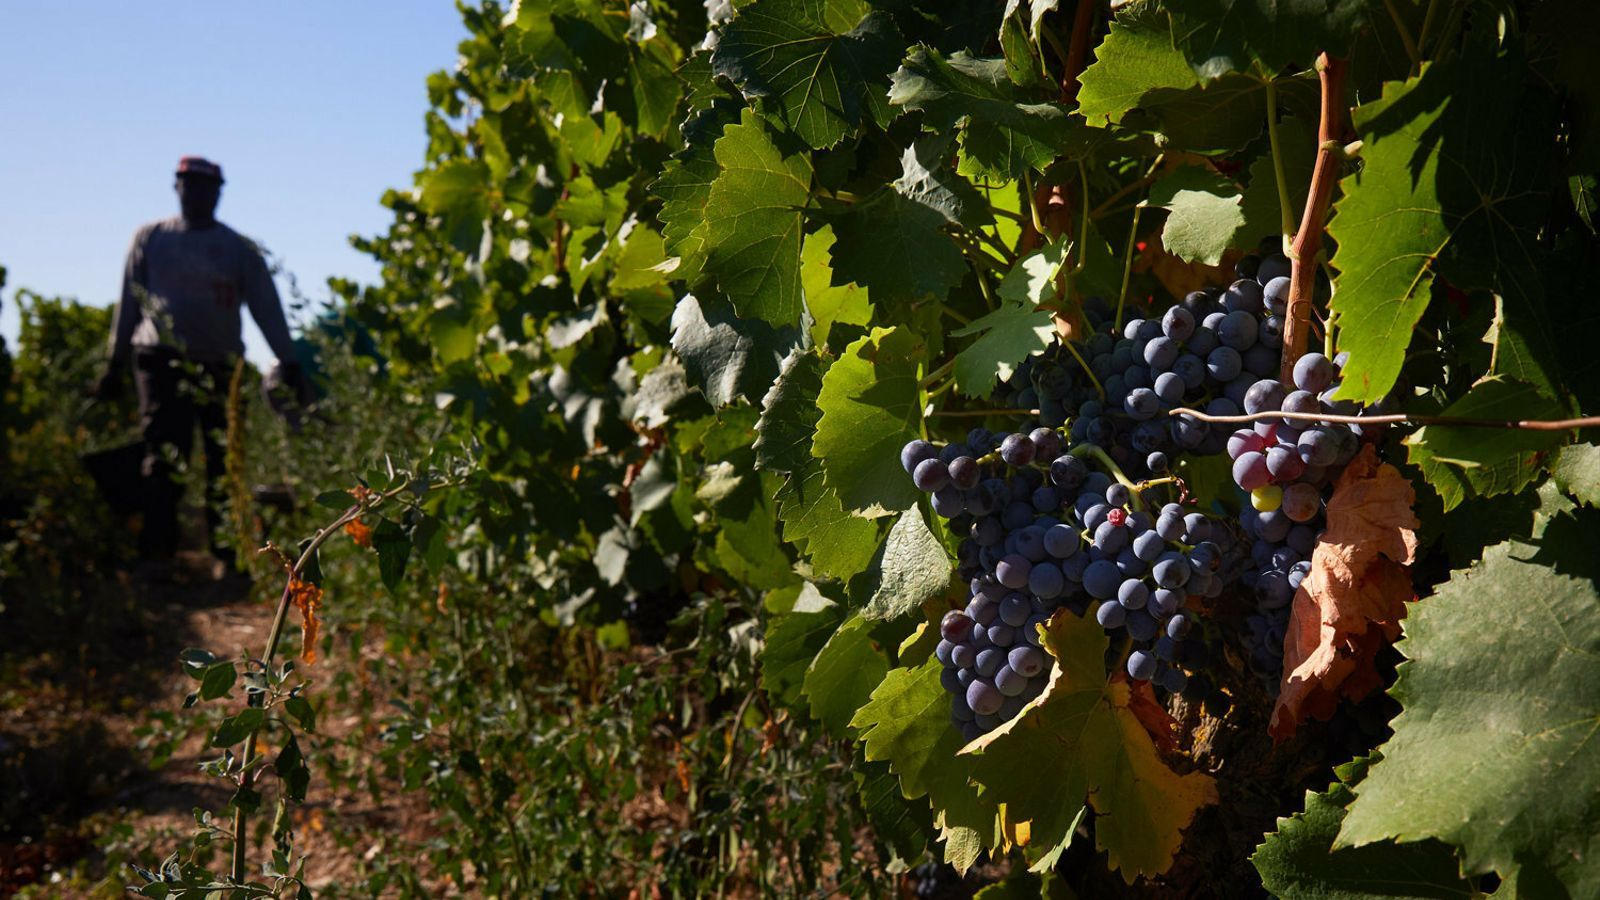 La collita de raïm donarà un vi excepcional en aroma i sabor